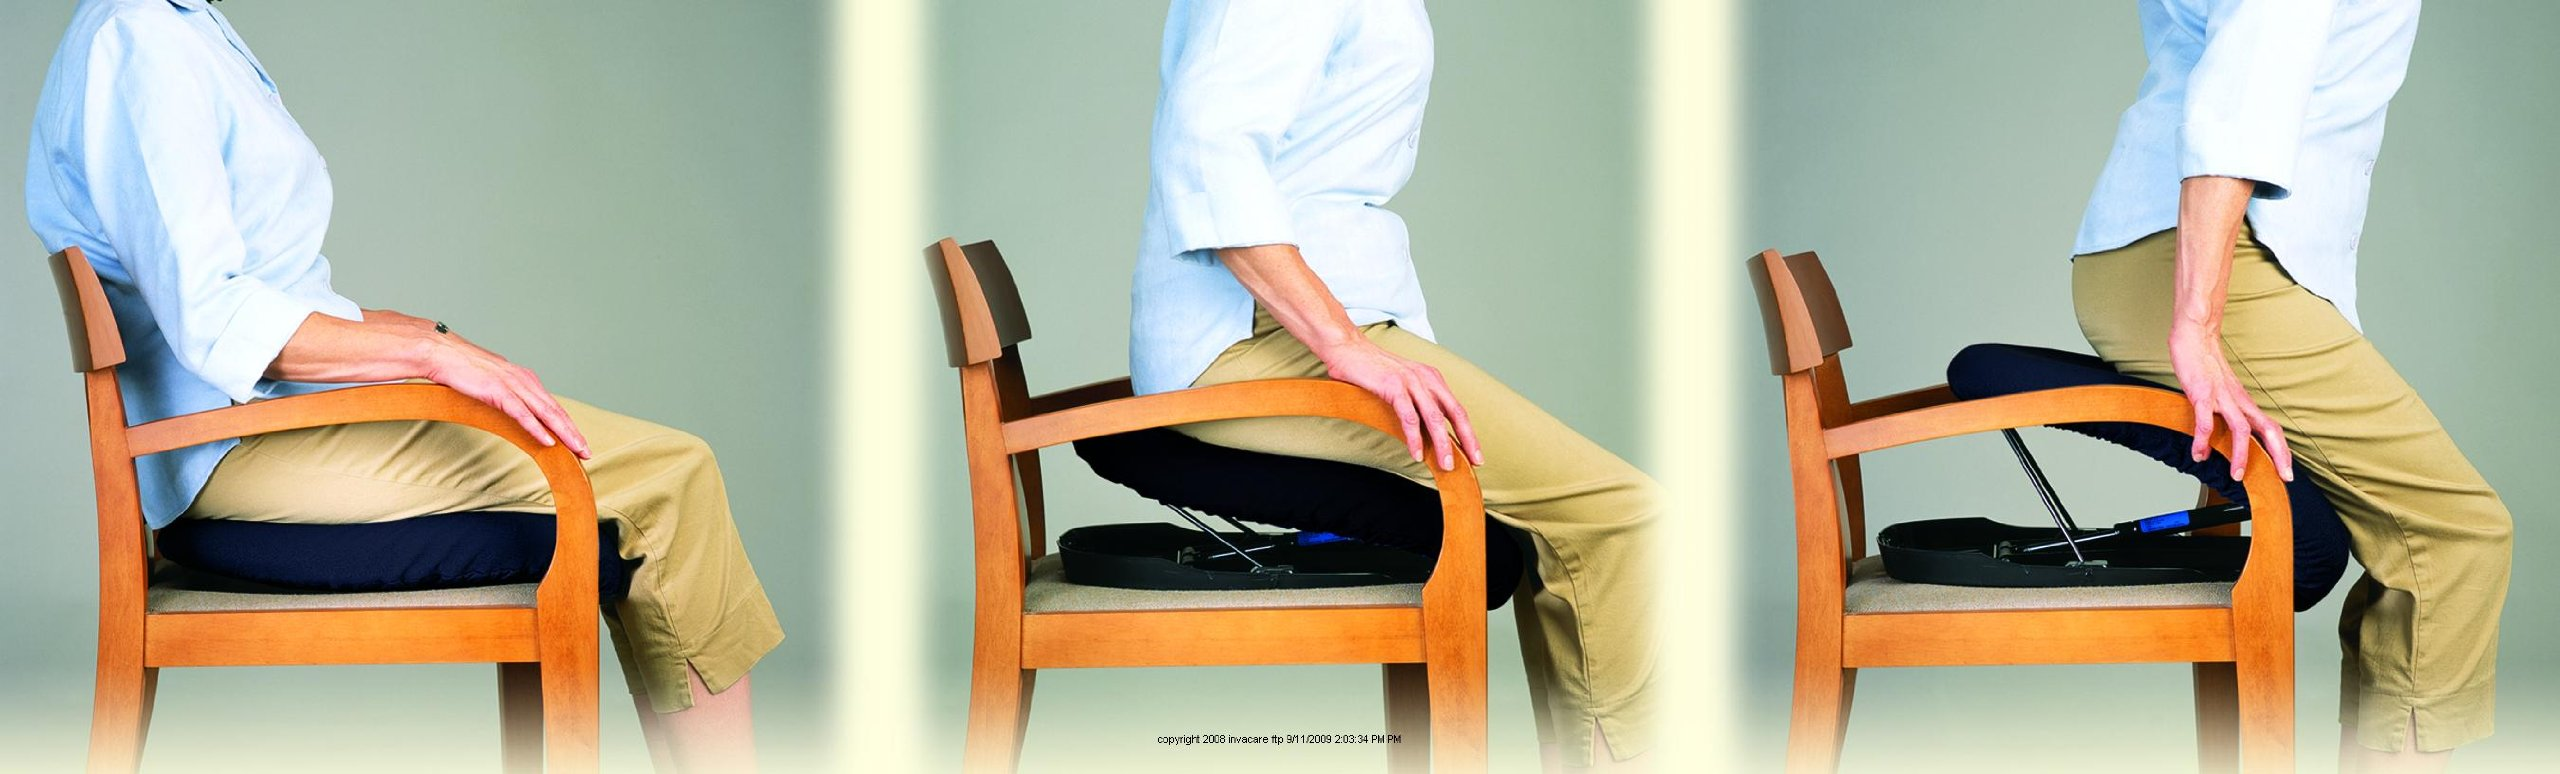 Uplift Seat Assist, Uplift Seat Assist 200-350Lbs, (1 EACH, 1 EACH)